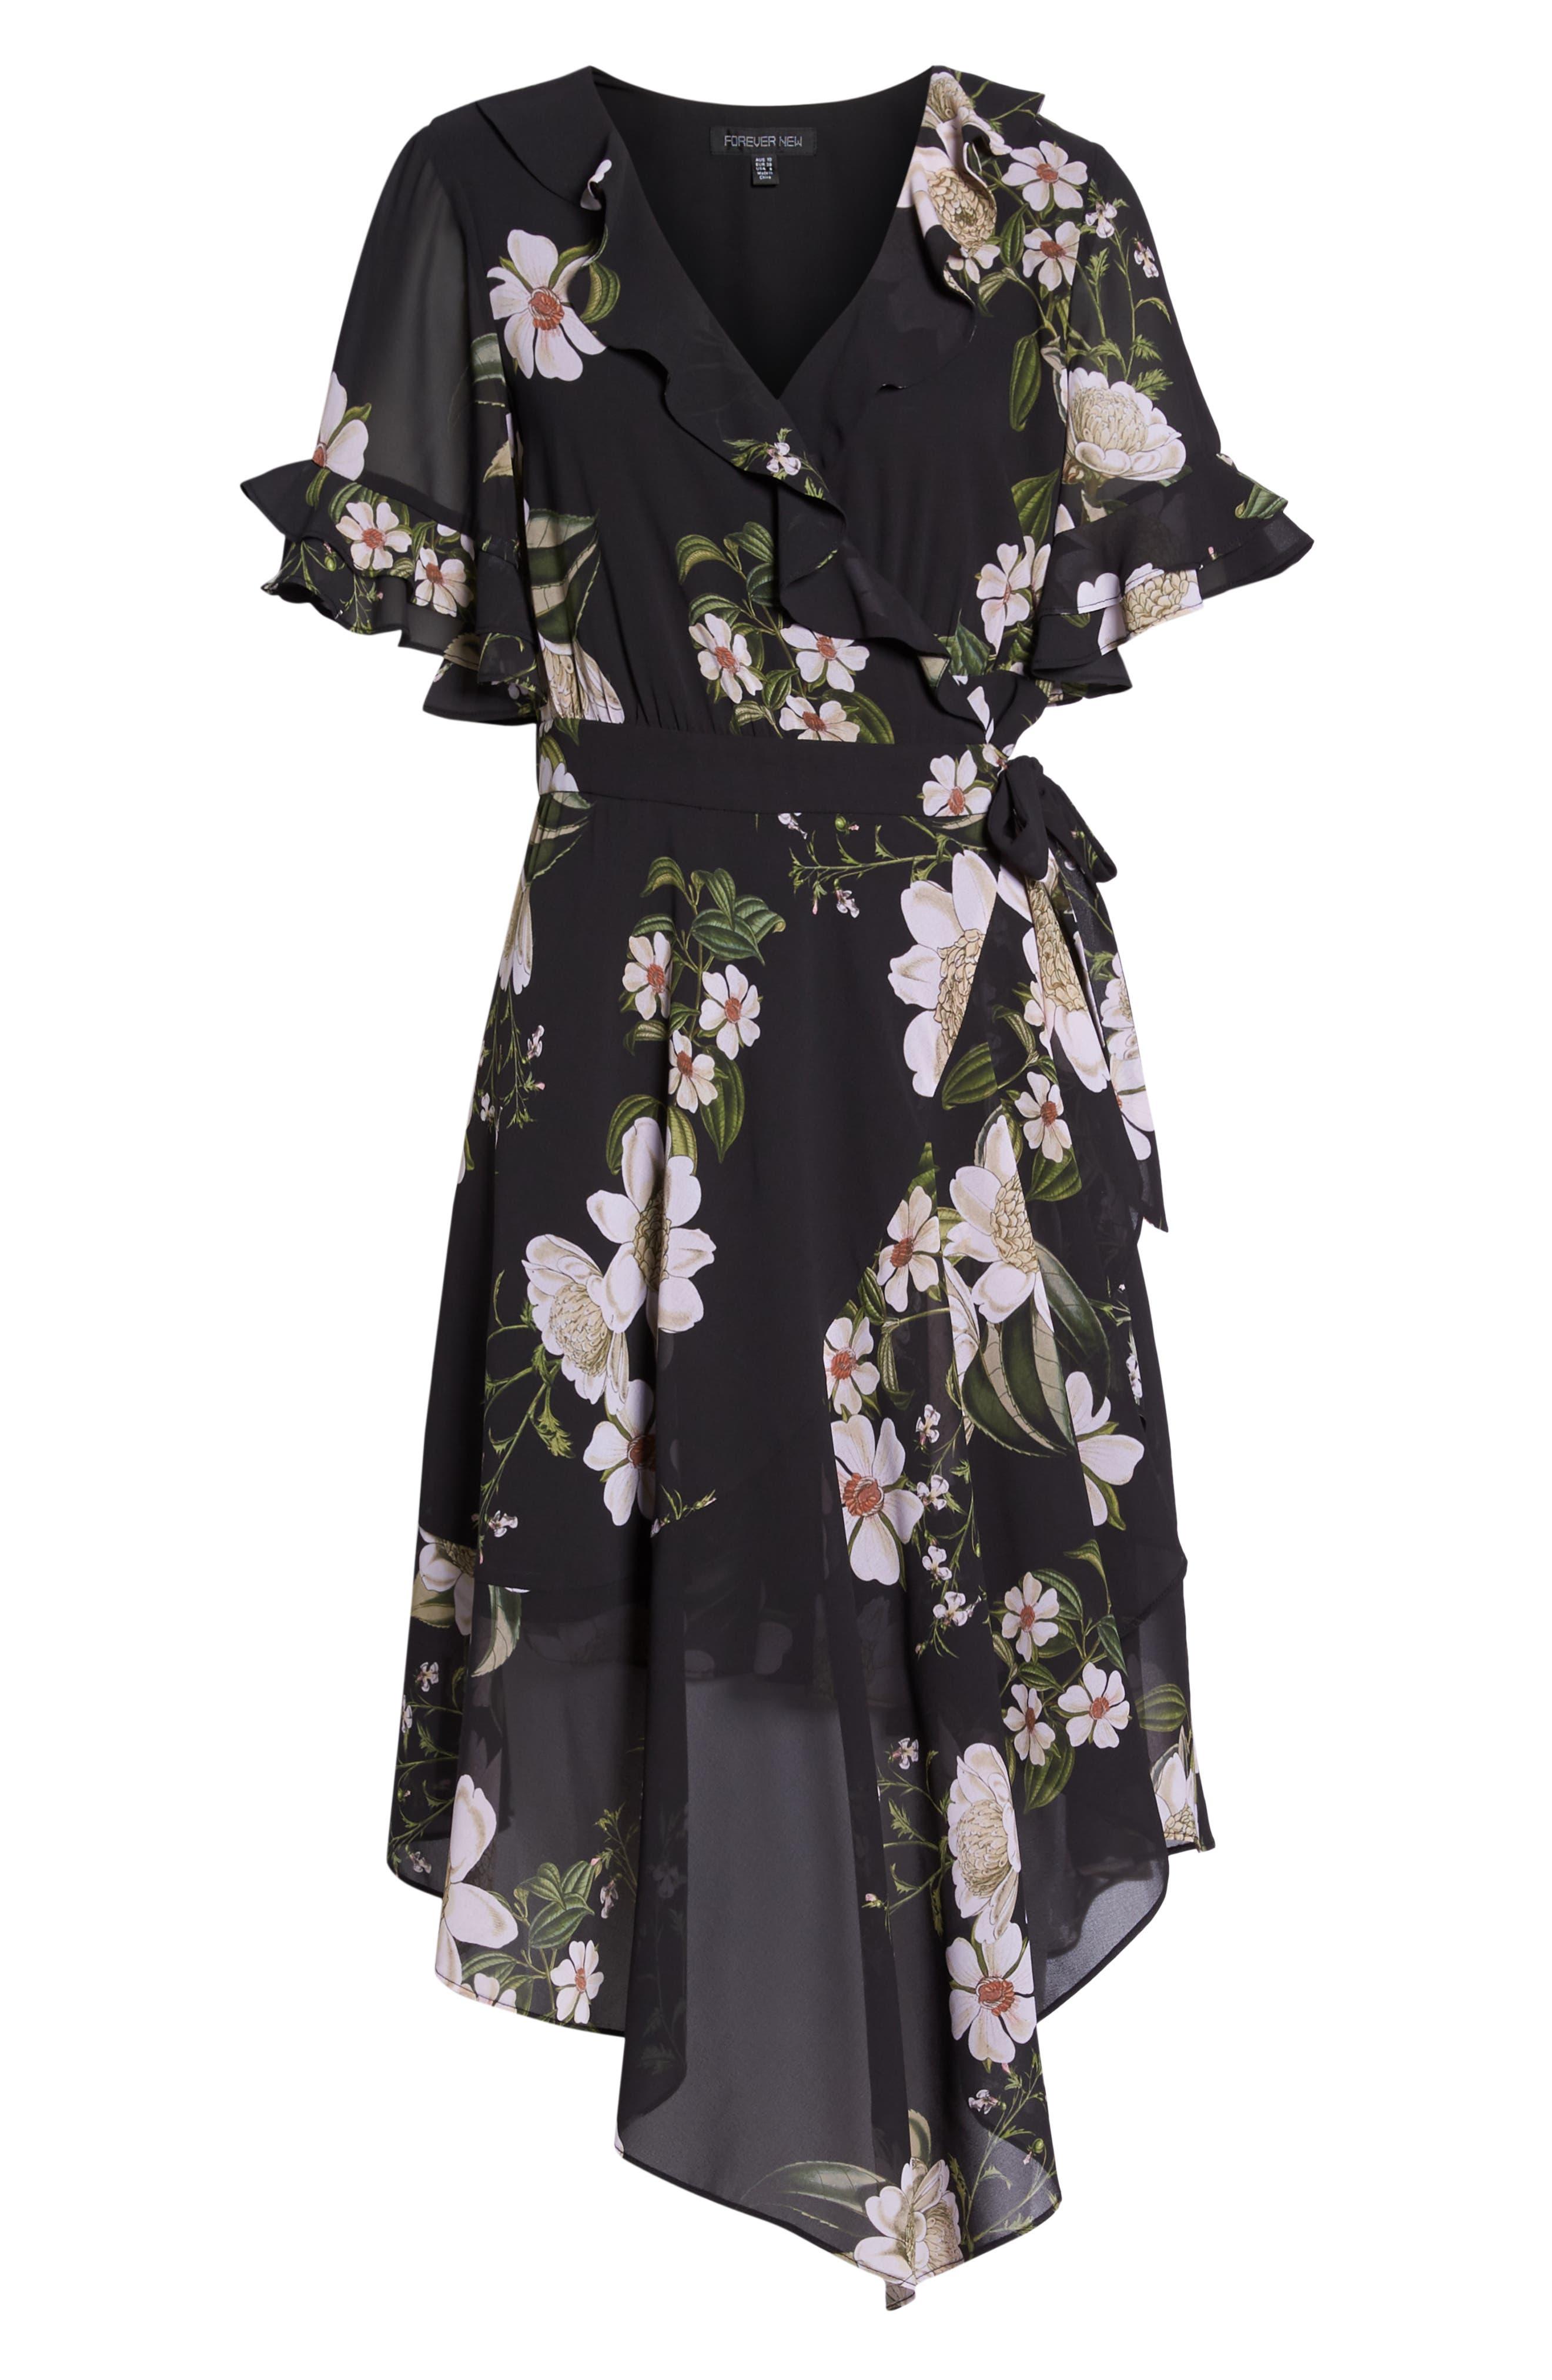 Floral Print Wrap Dress,                             Alternate thumbnail 7, color,                             Dark Floral Print